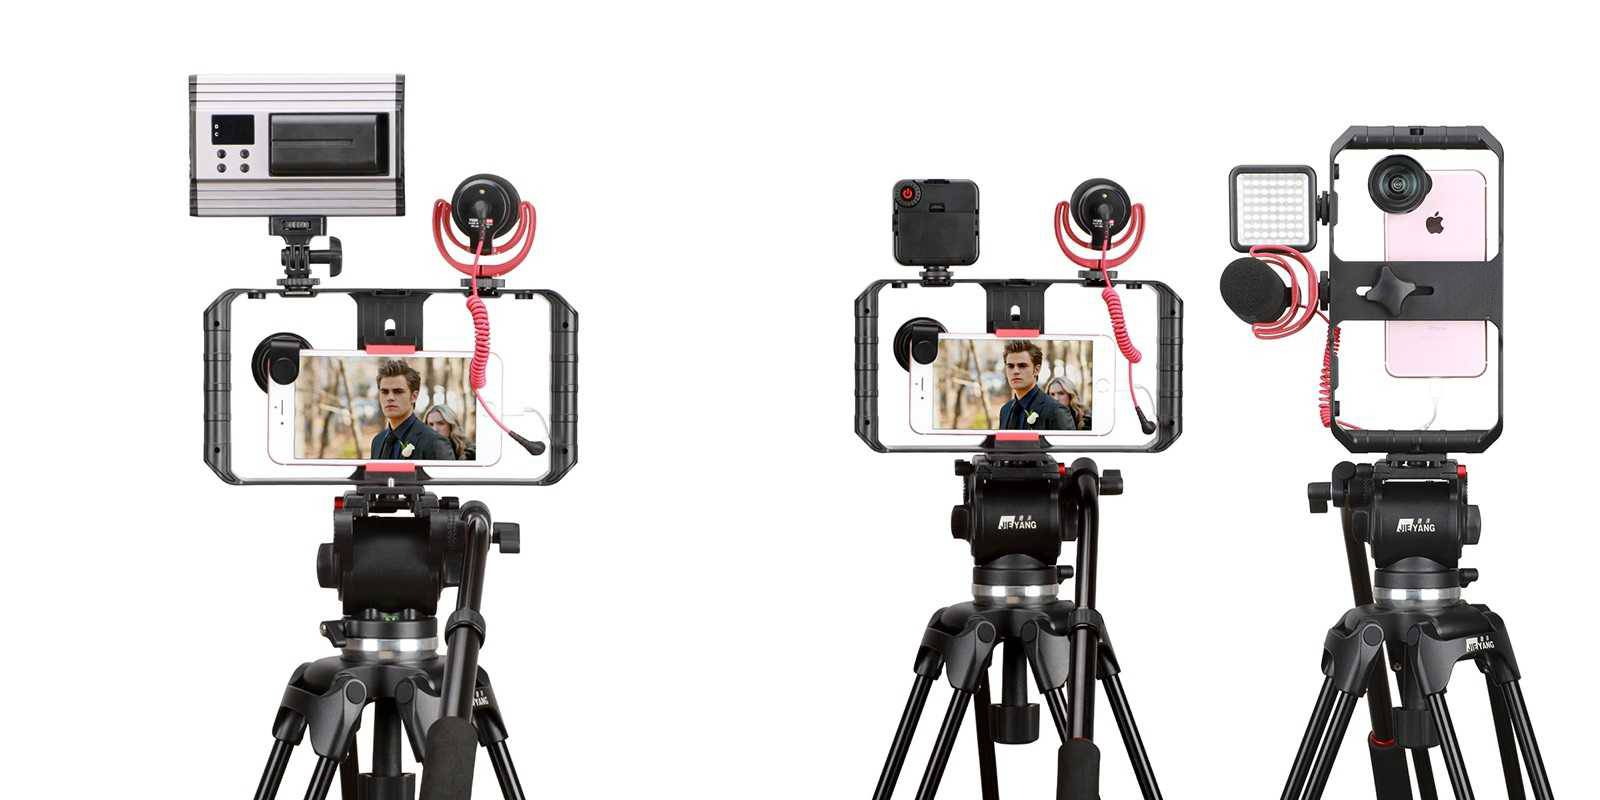 film-technika-ulanzi-u-rig-pro-galerie-01-2